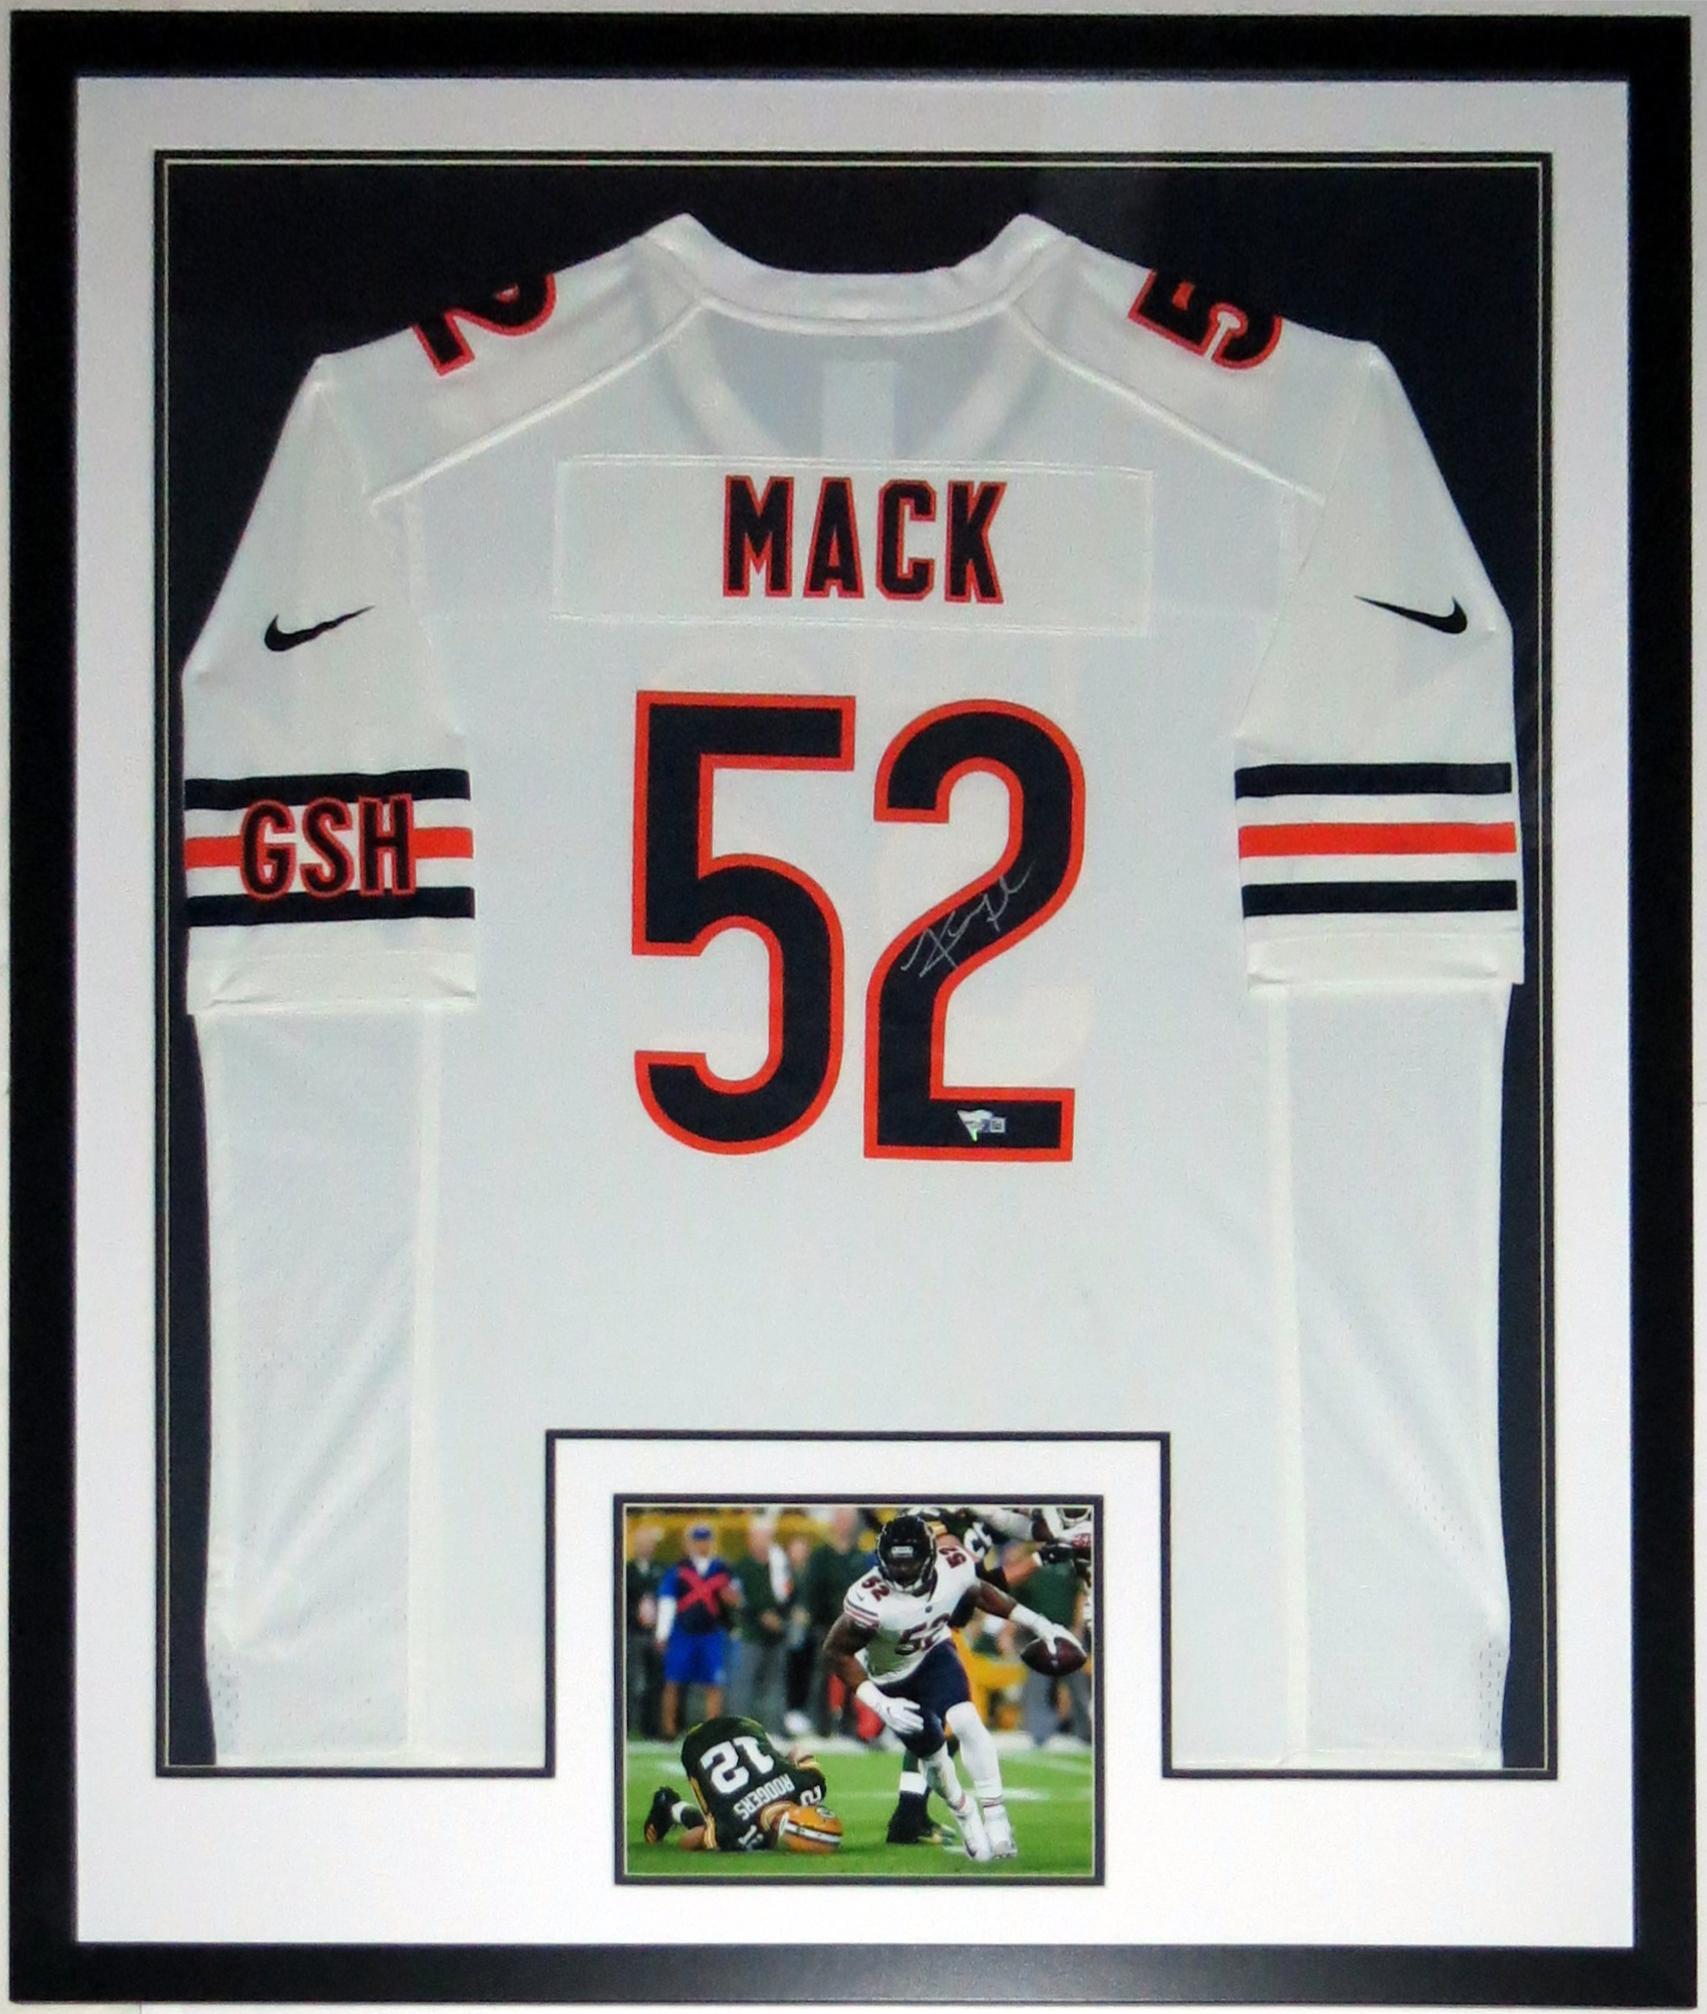 Khalil Mack Signed Nike Chicago Bears Jersey - Fanatics COA Authenticated - Professionally Framed & 1st Game 8x10 Photo 34x42